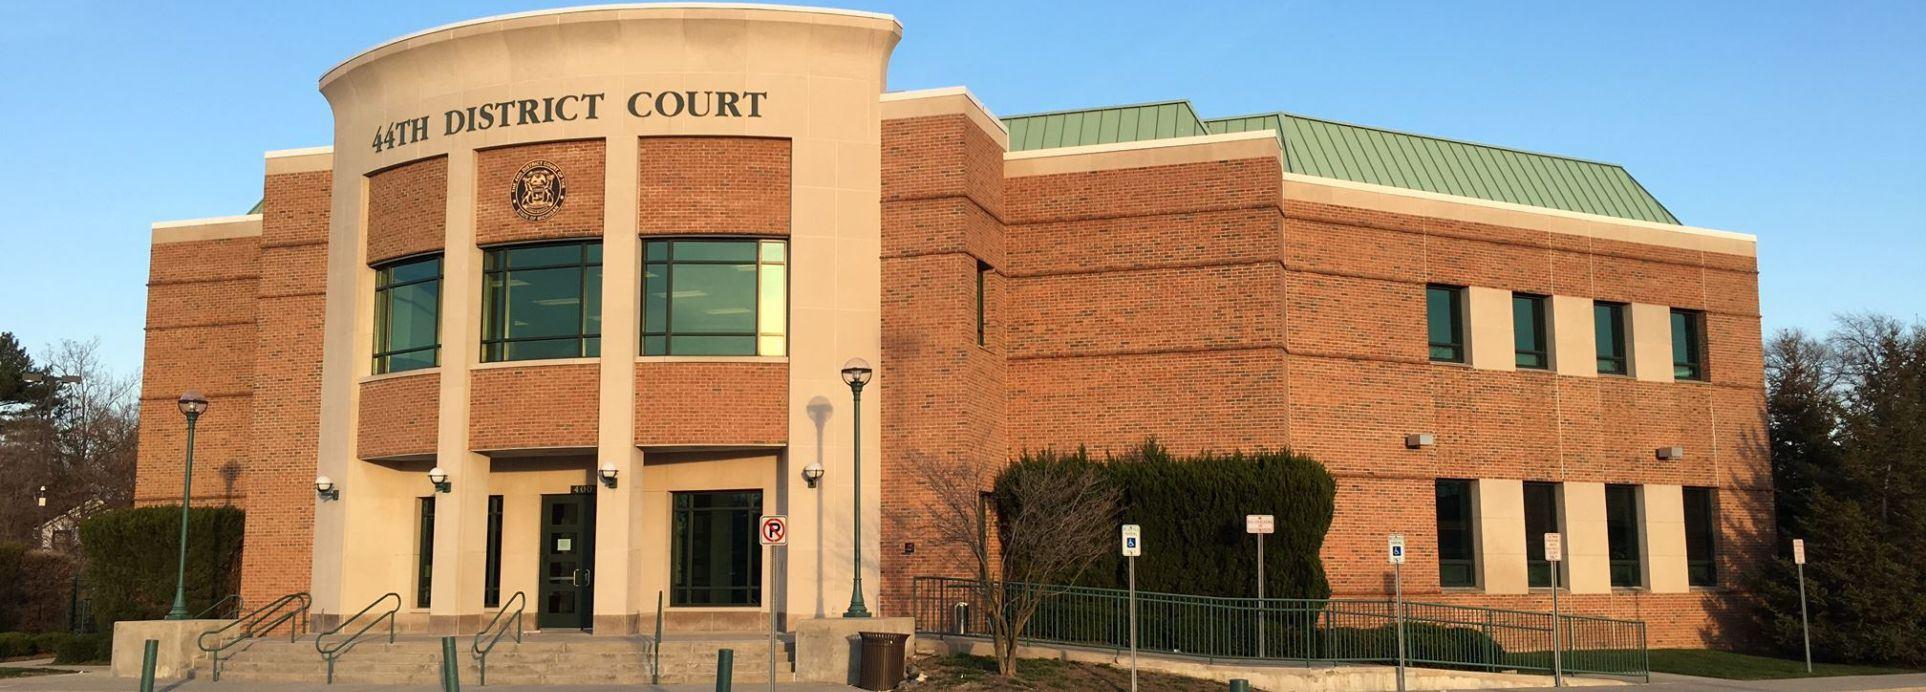 Courthouse clipart district court.  th royal oak